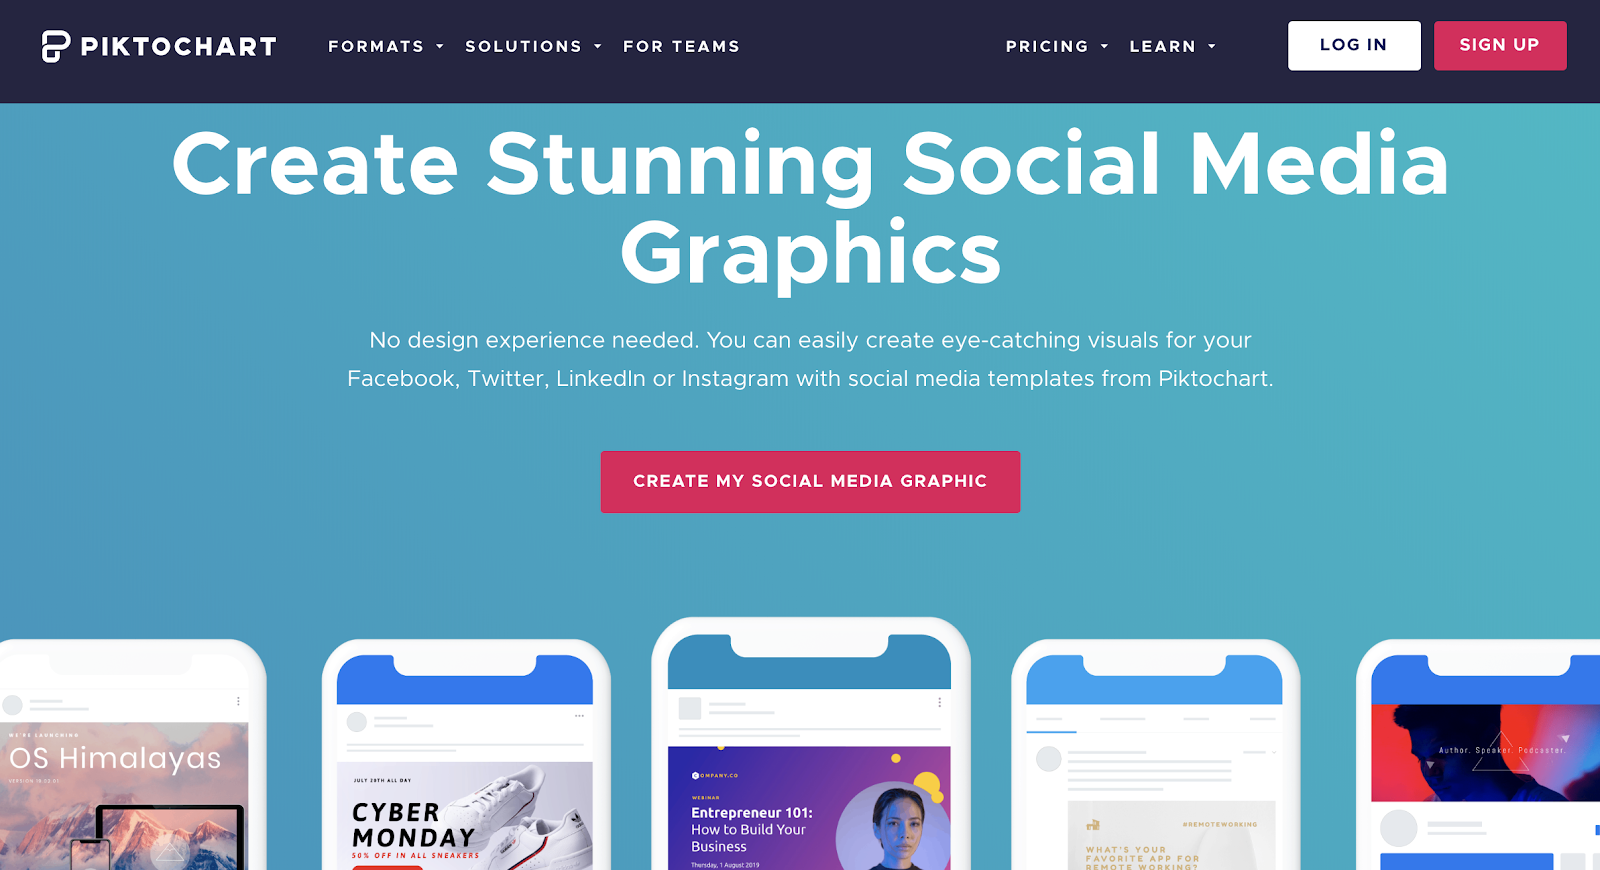 piktochart tool for creating social media graphics